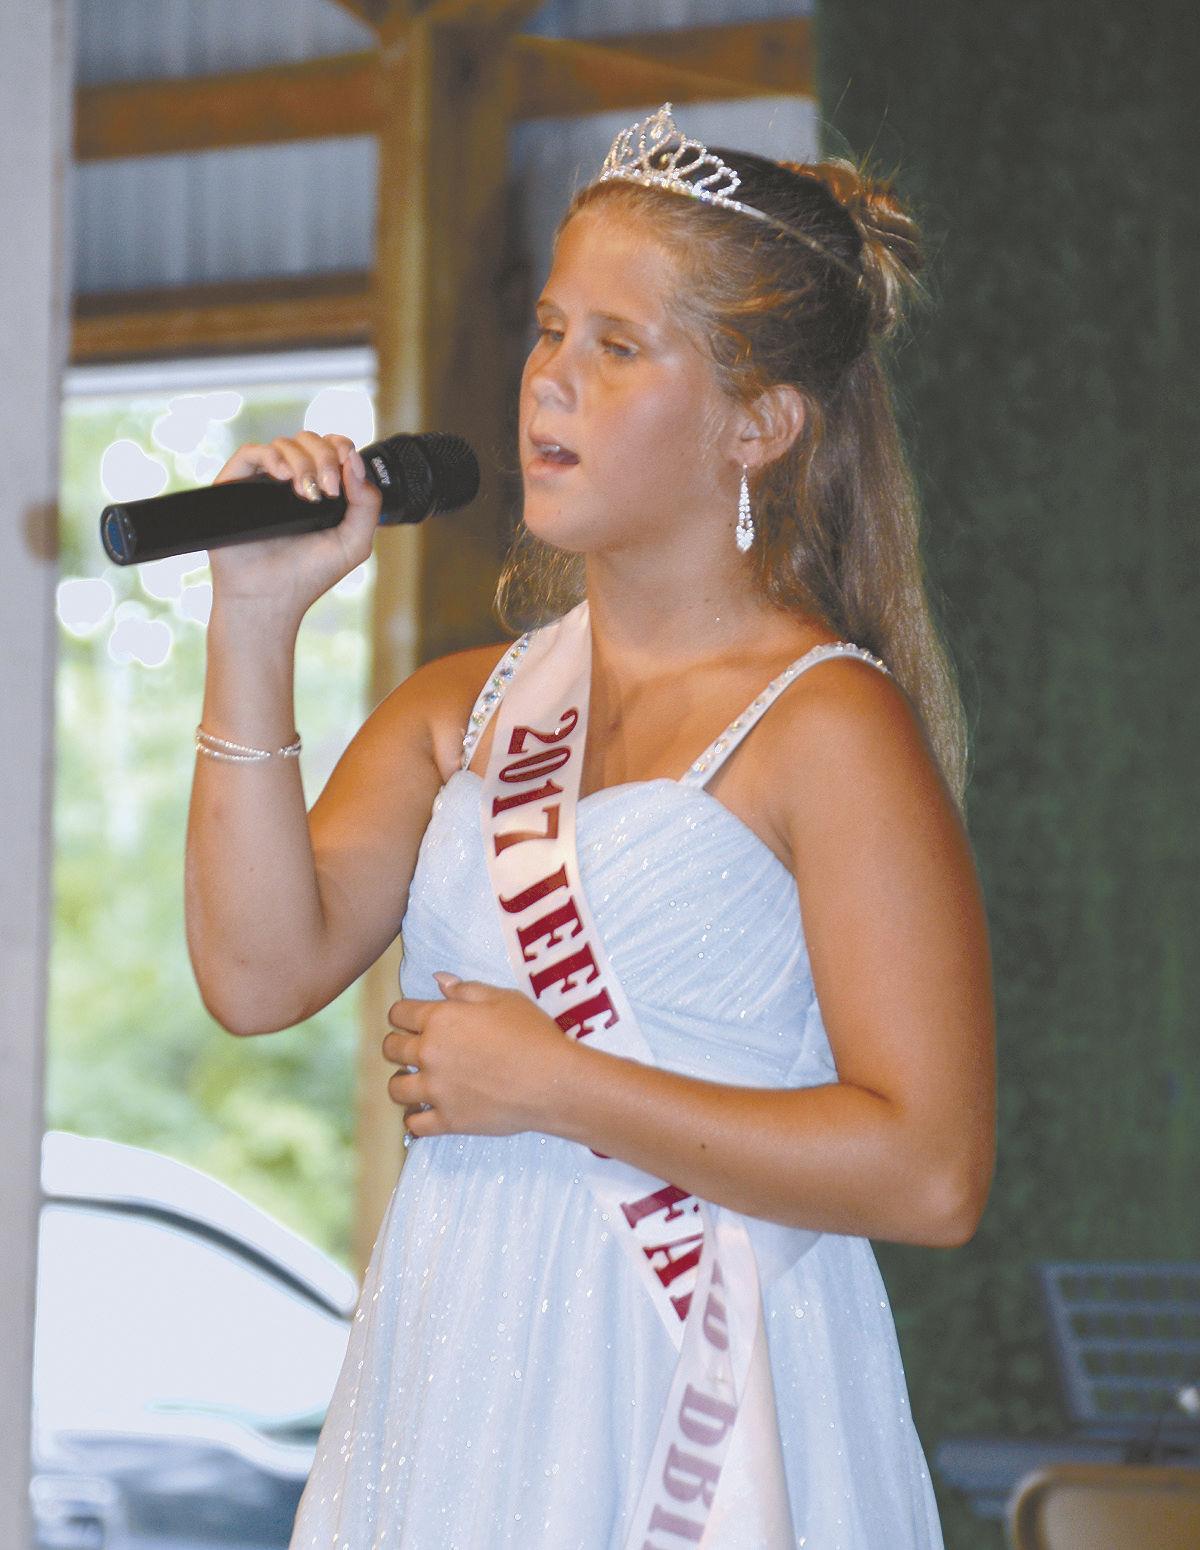 2017 fair princess sings